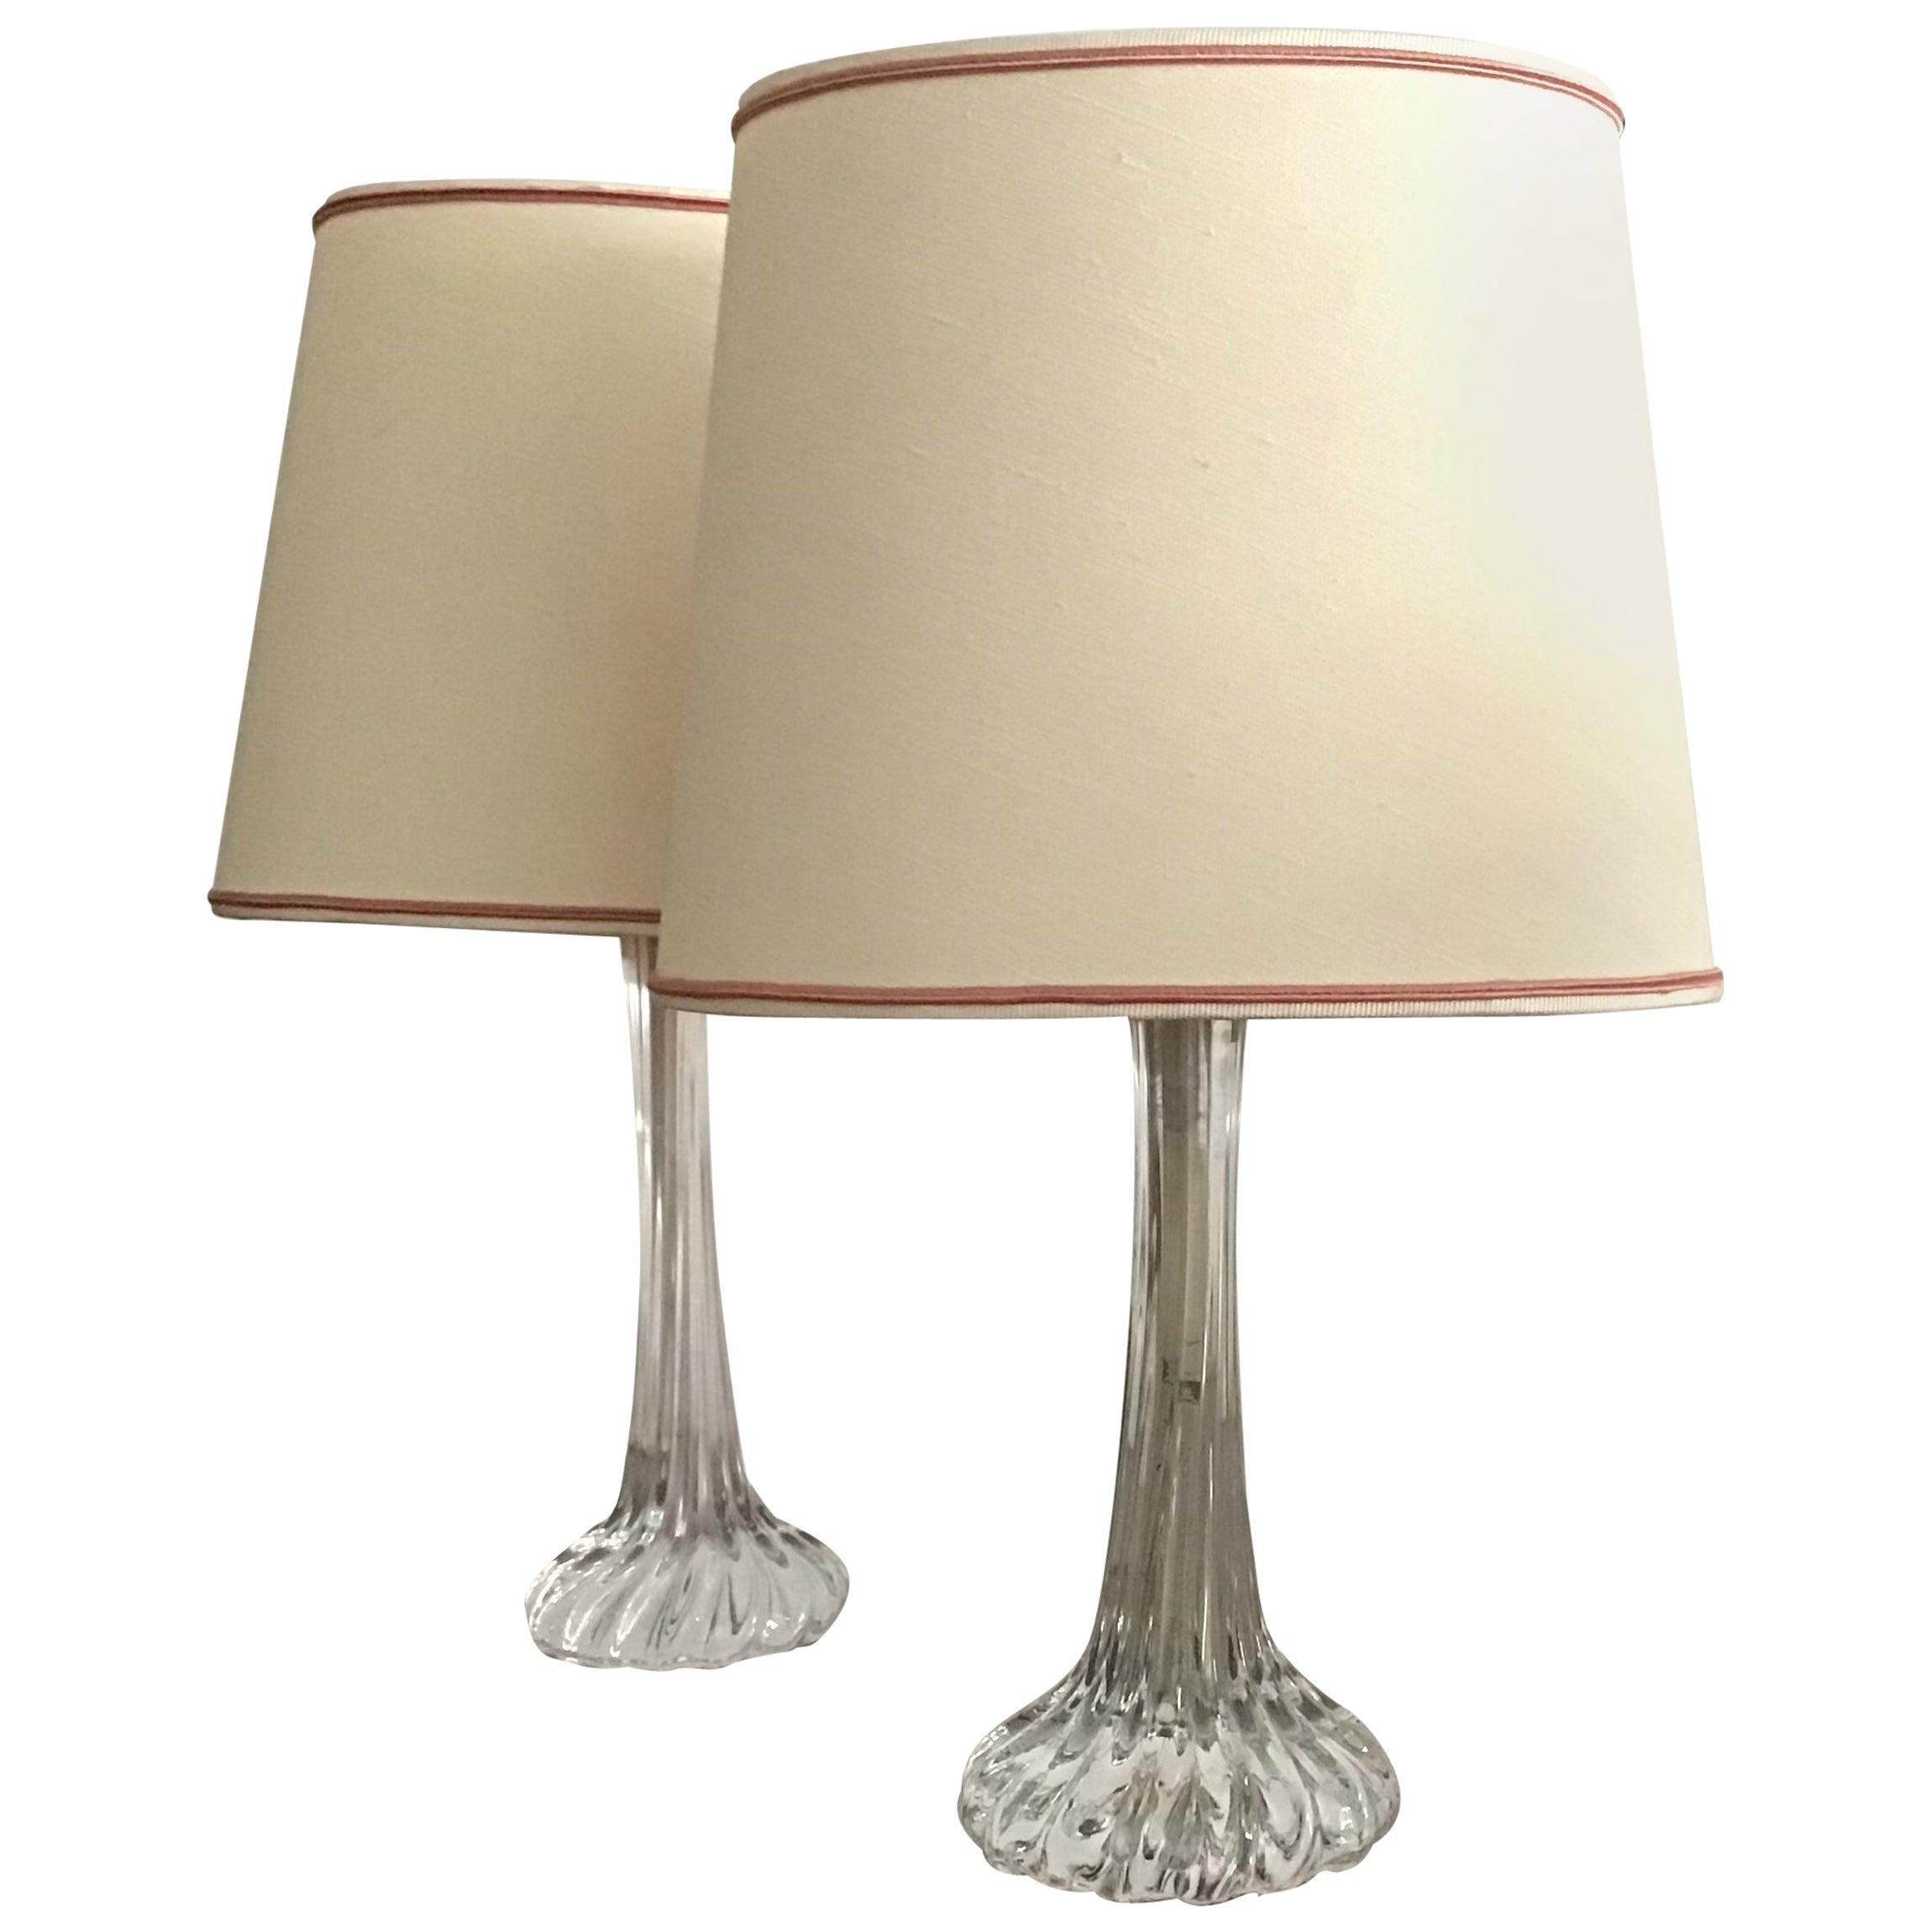 Seguso Table Lamps Murano Glass, 1950, Italy